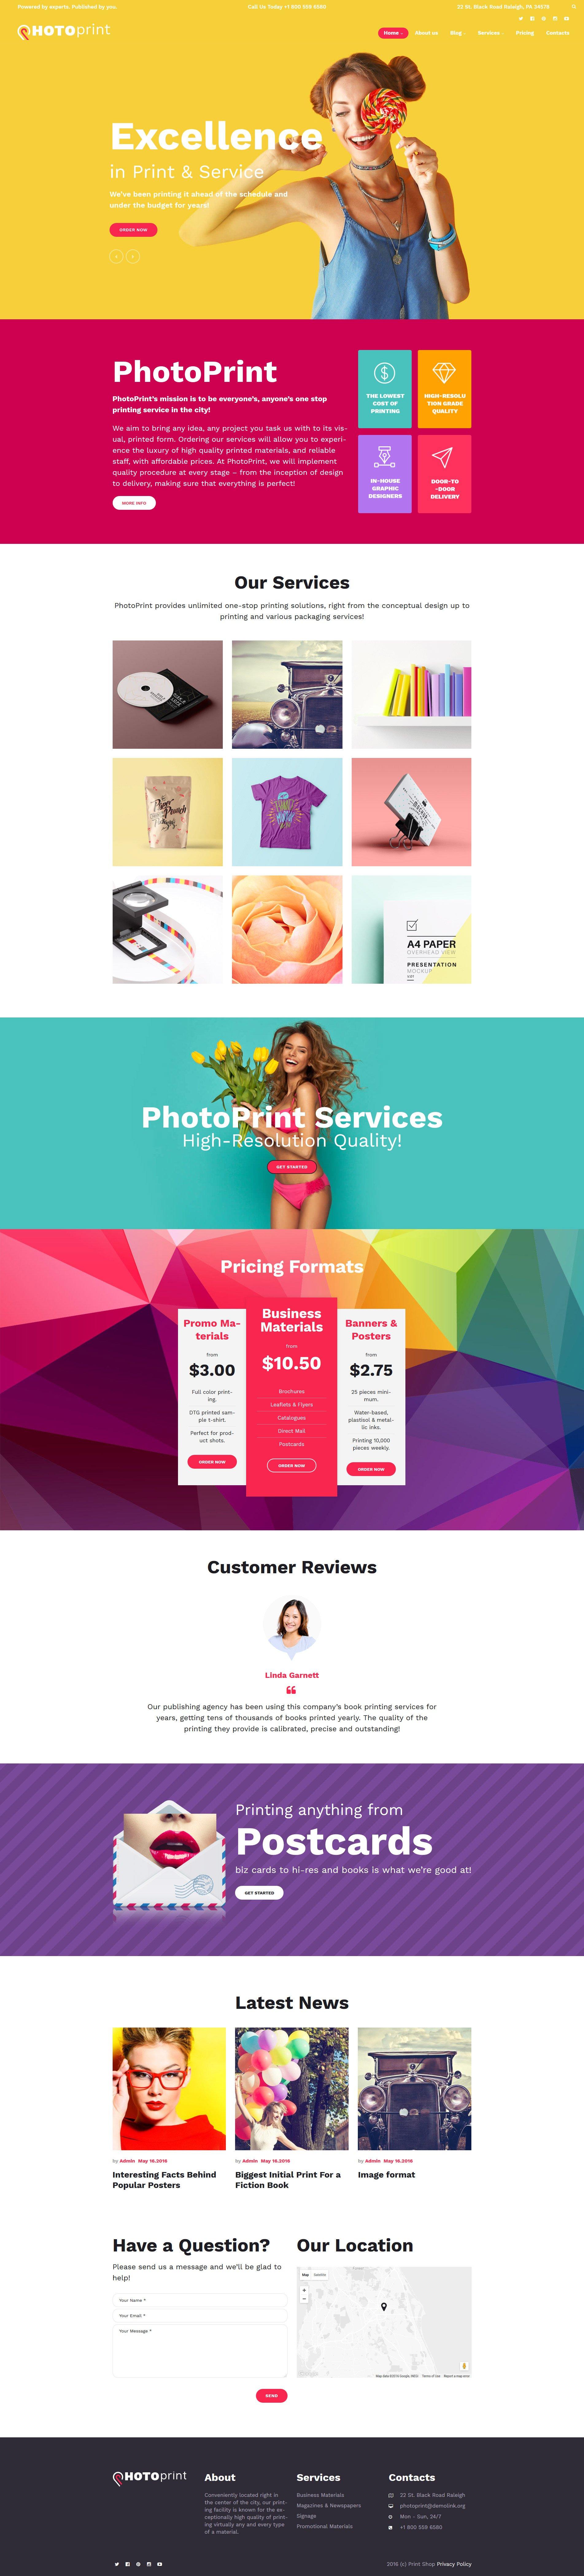 PhotoPrint - Print Shop Responsive №60122 - скриншот